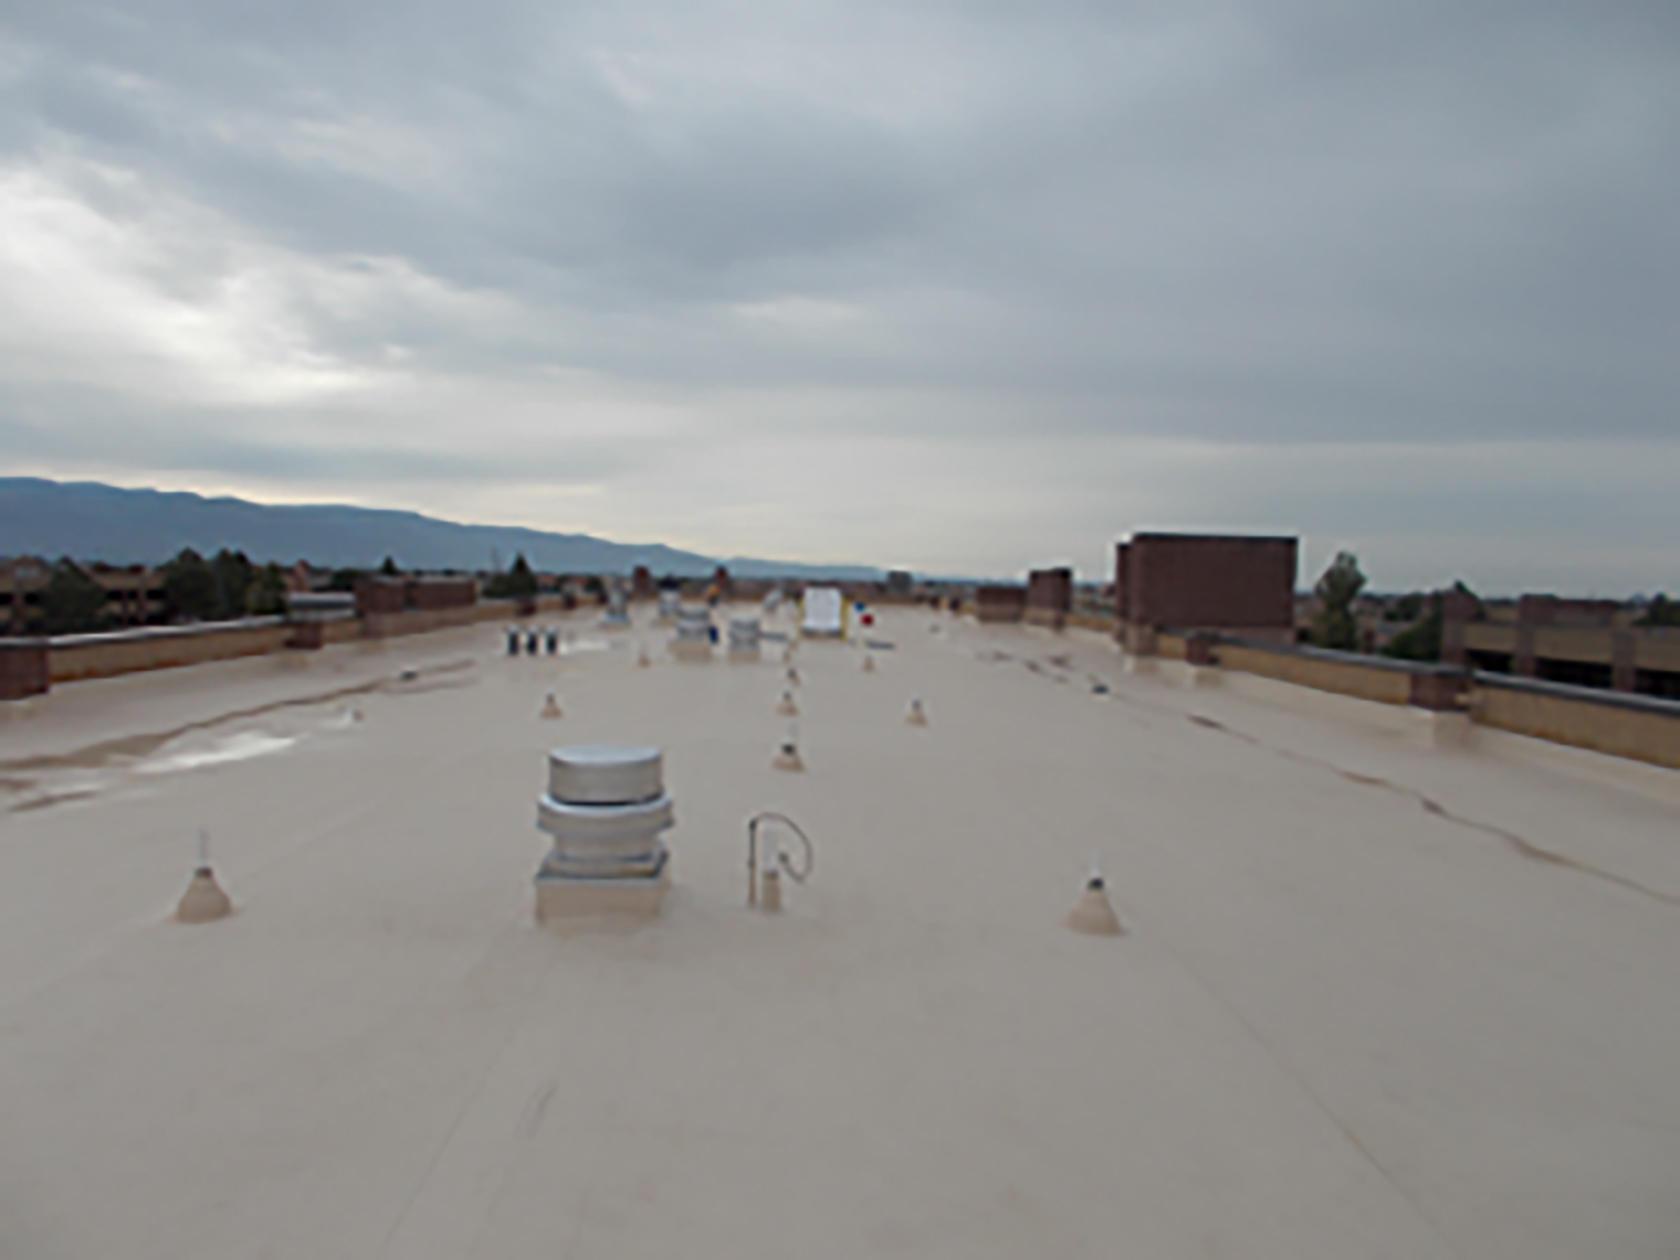 Professional Roofers & Contractors image 21